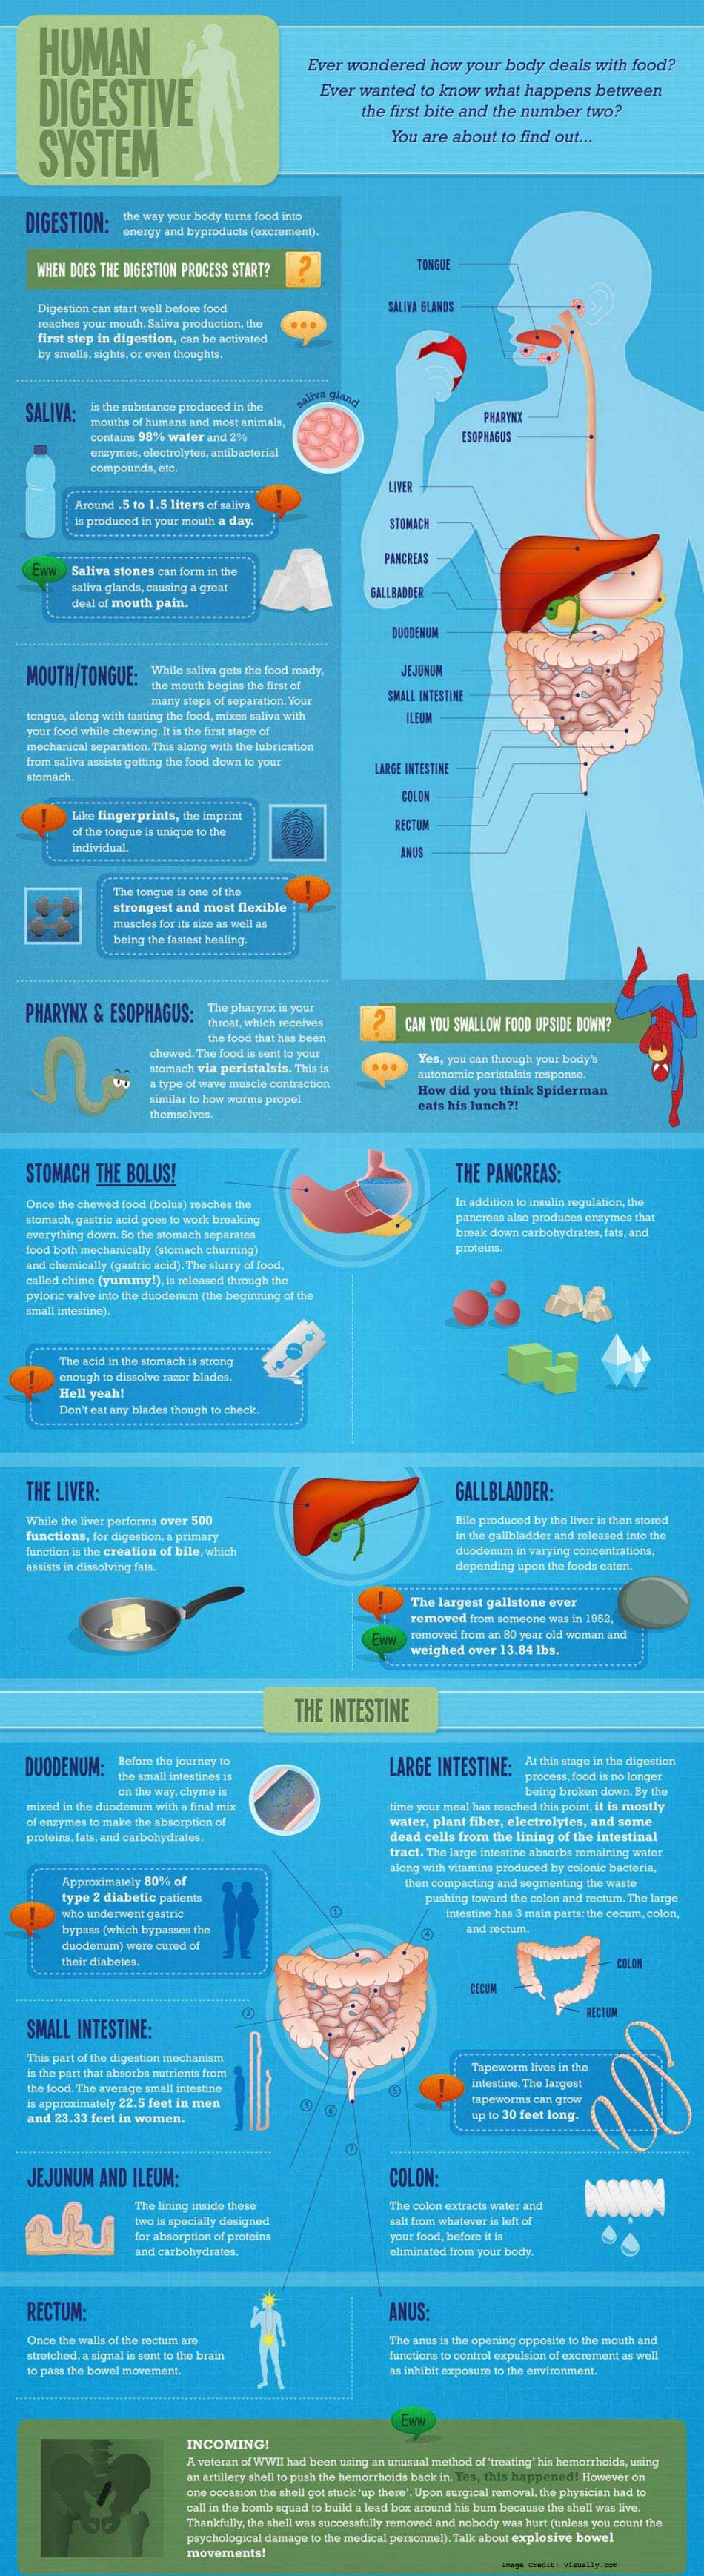 Human Digestive System Info